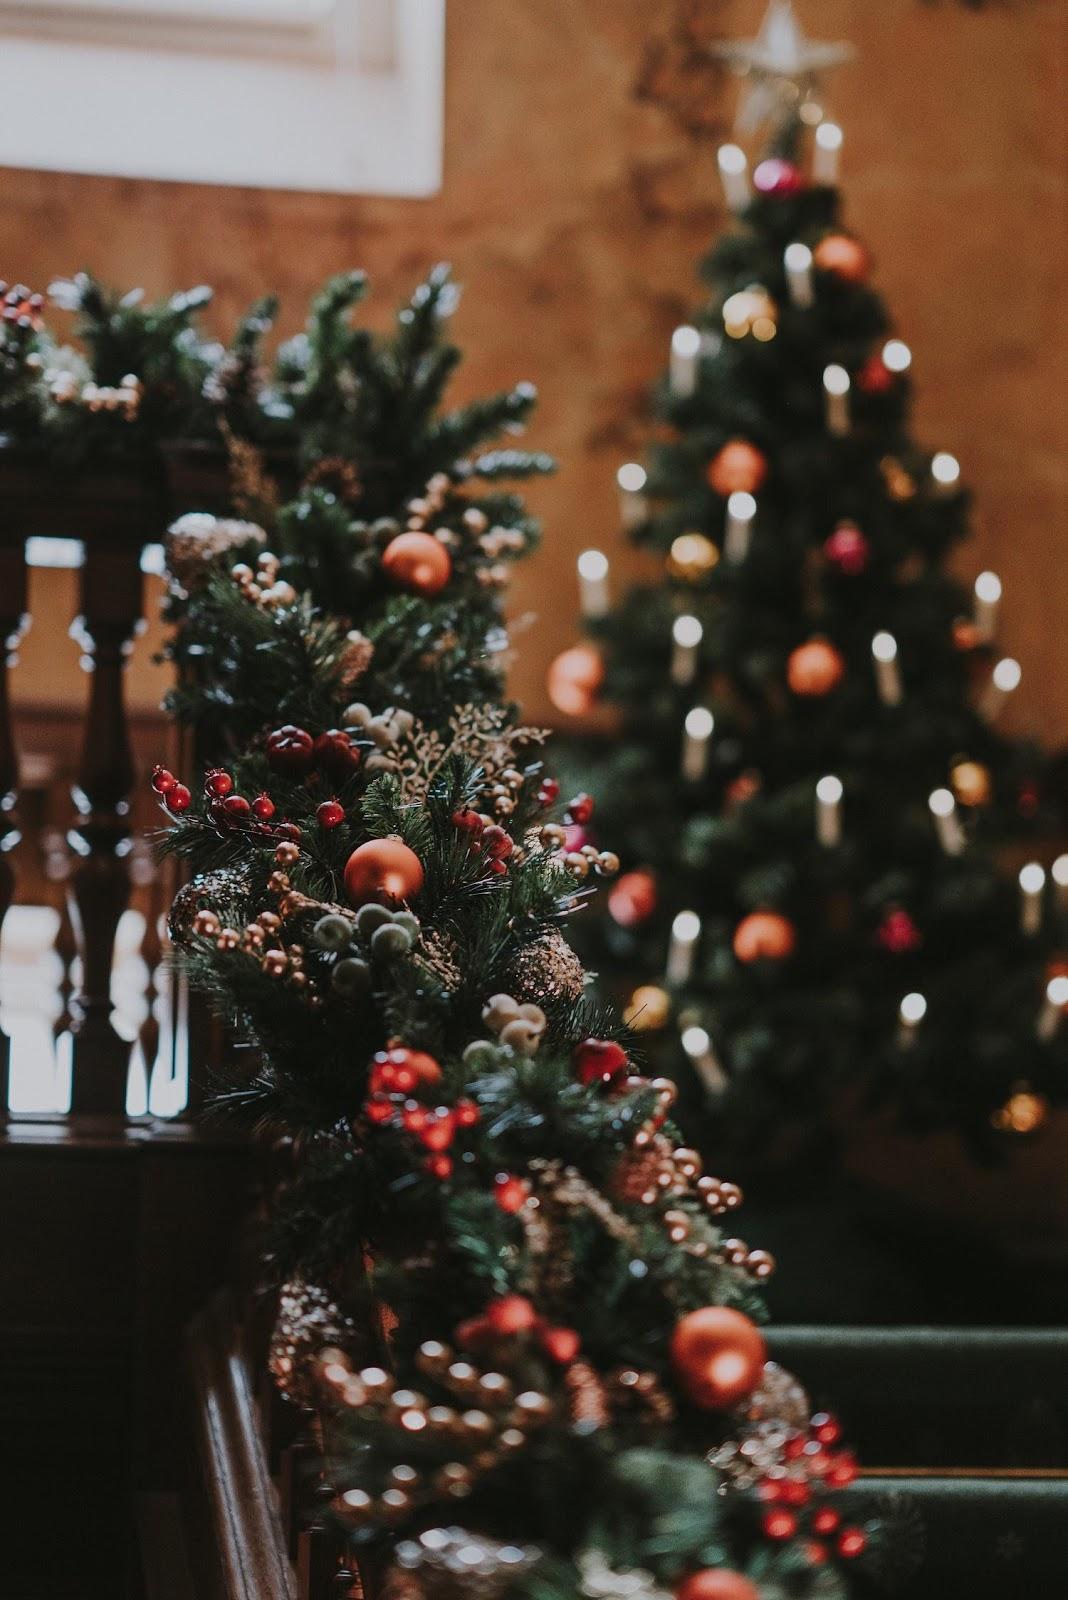 DIY Christmas Decorations - Garland